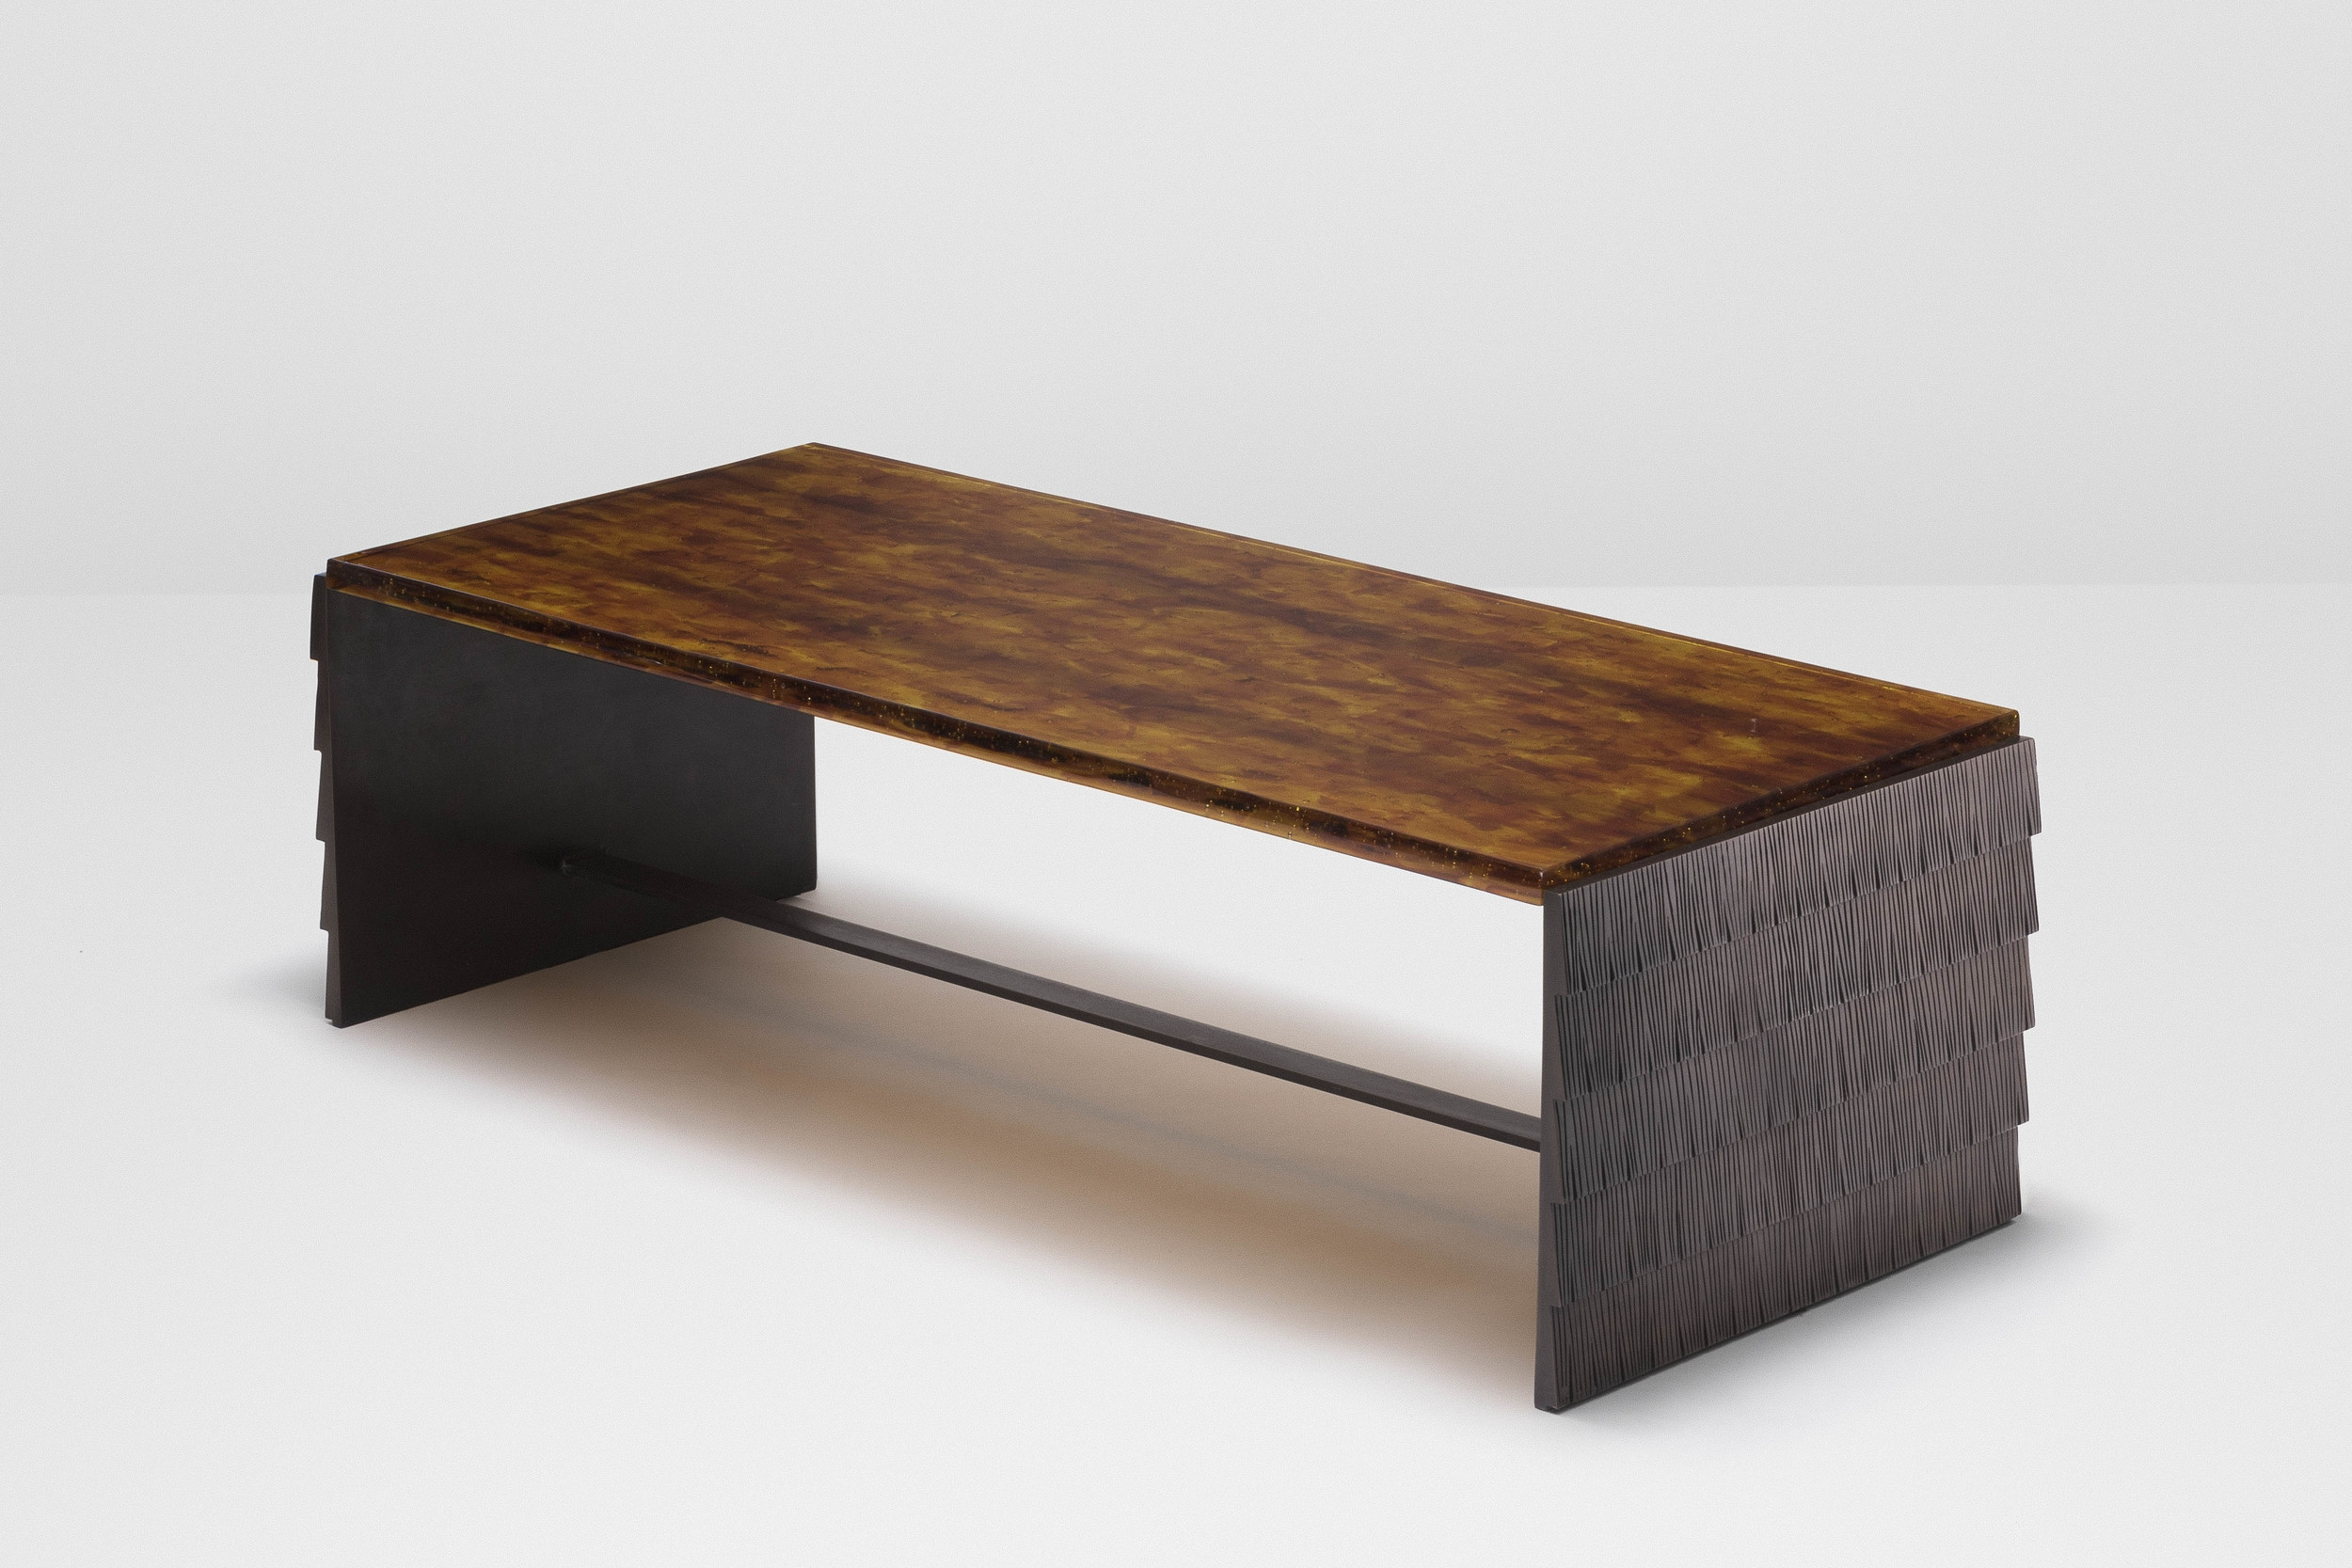 folding chair lulu single sofa sale the collection francis sultana maxi coffee table